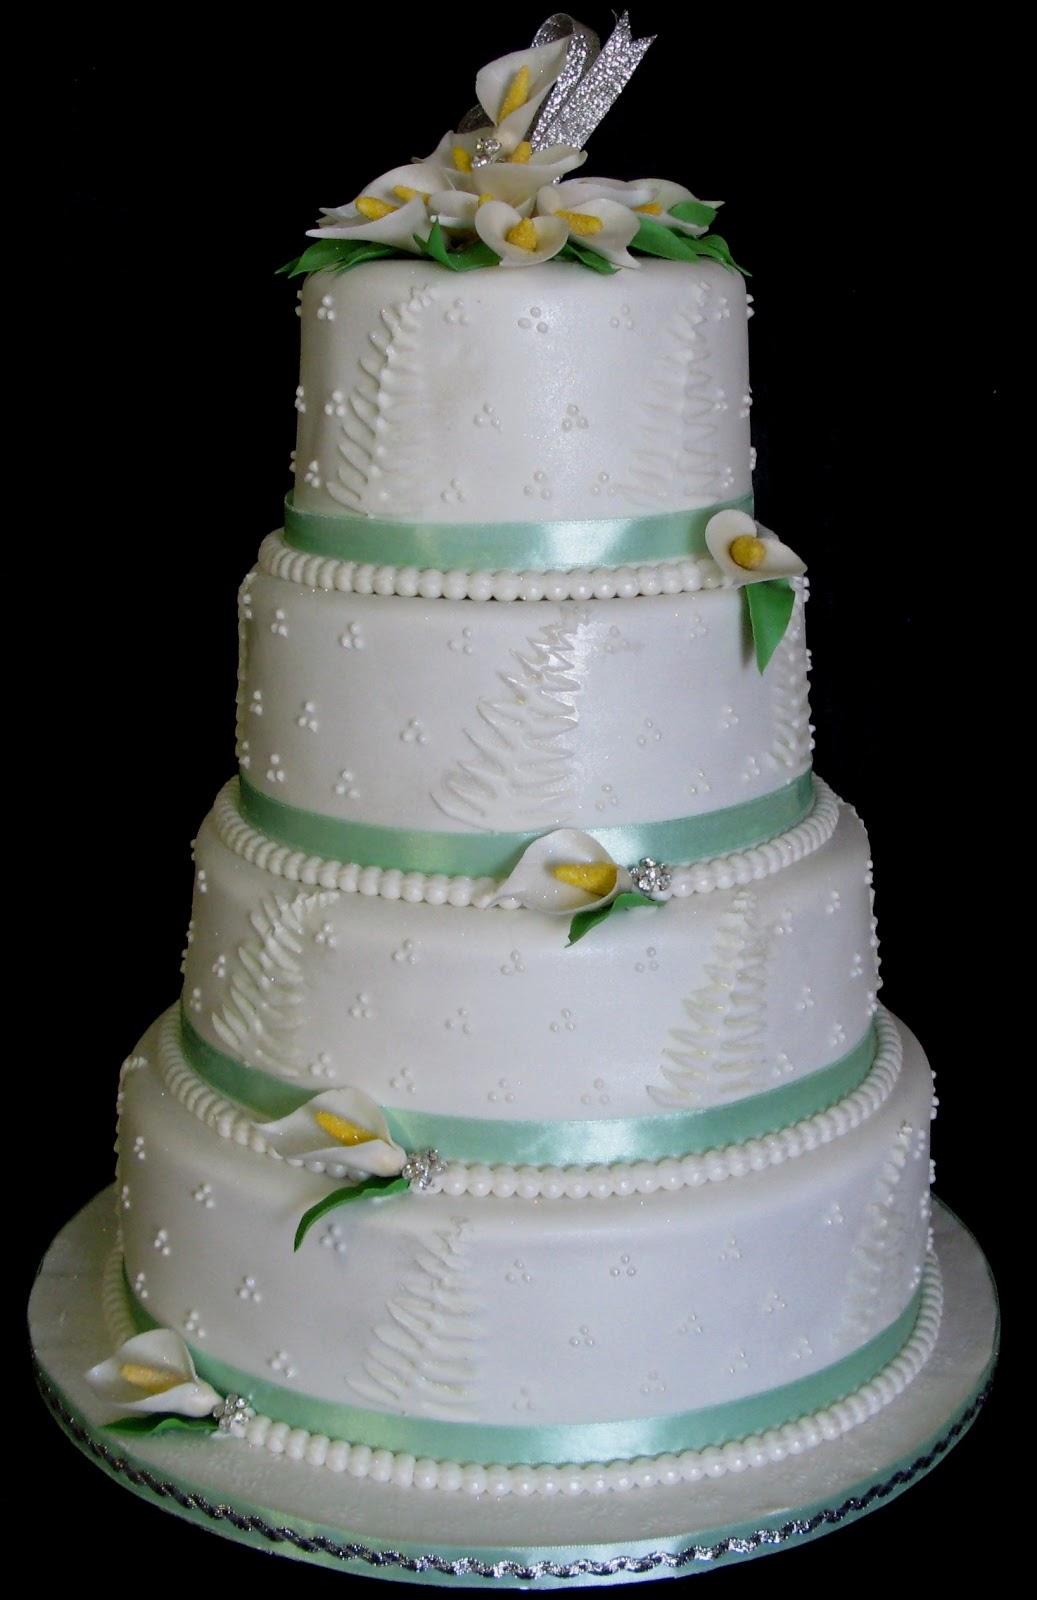 Sugarcraft By Soni Four Tier Wedding Cake Arum Lilies